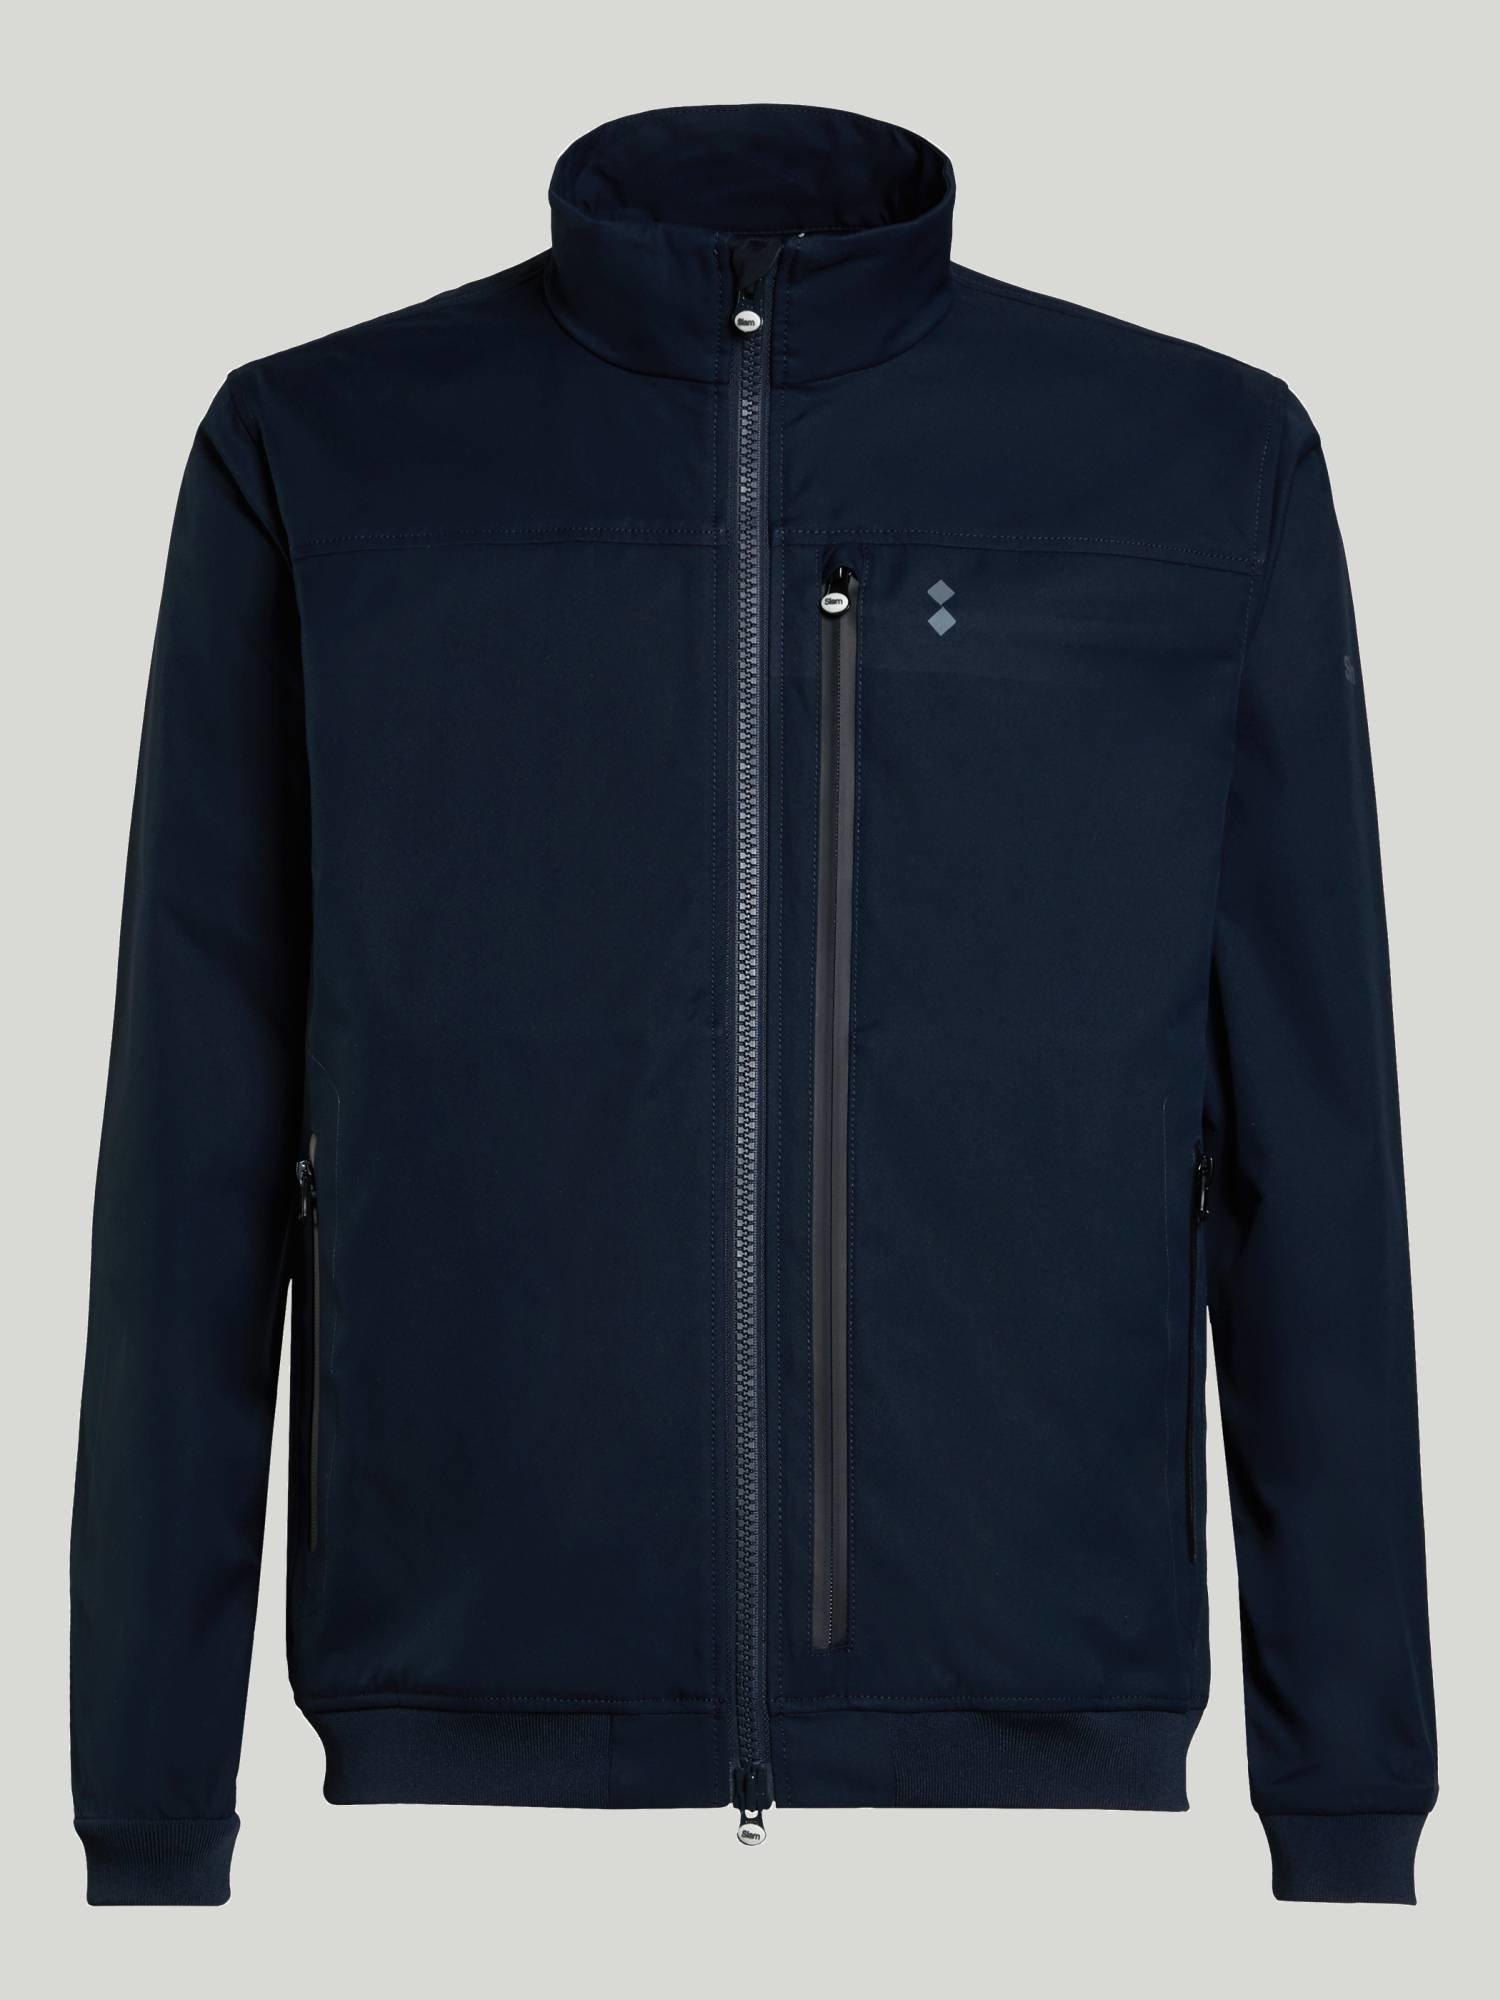 Jacket A65 - Marinenblau